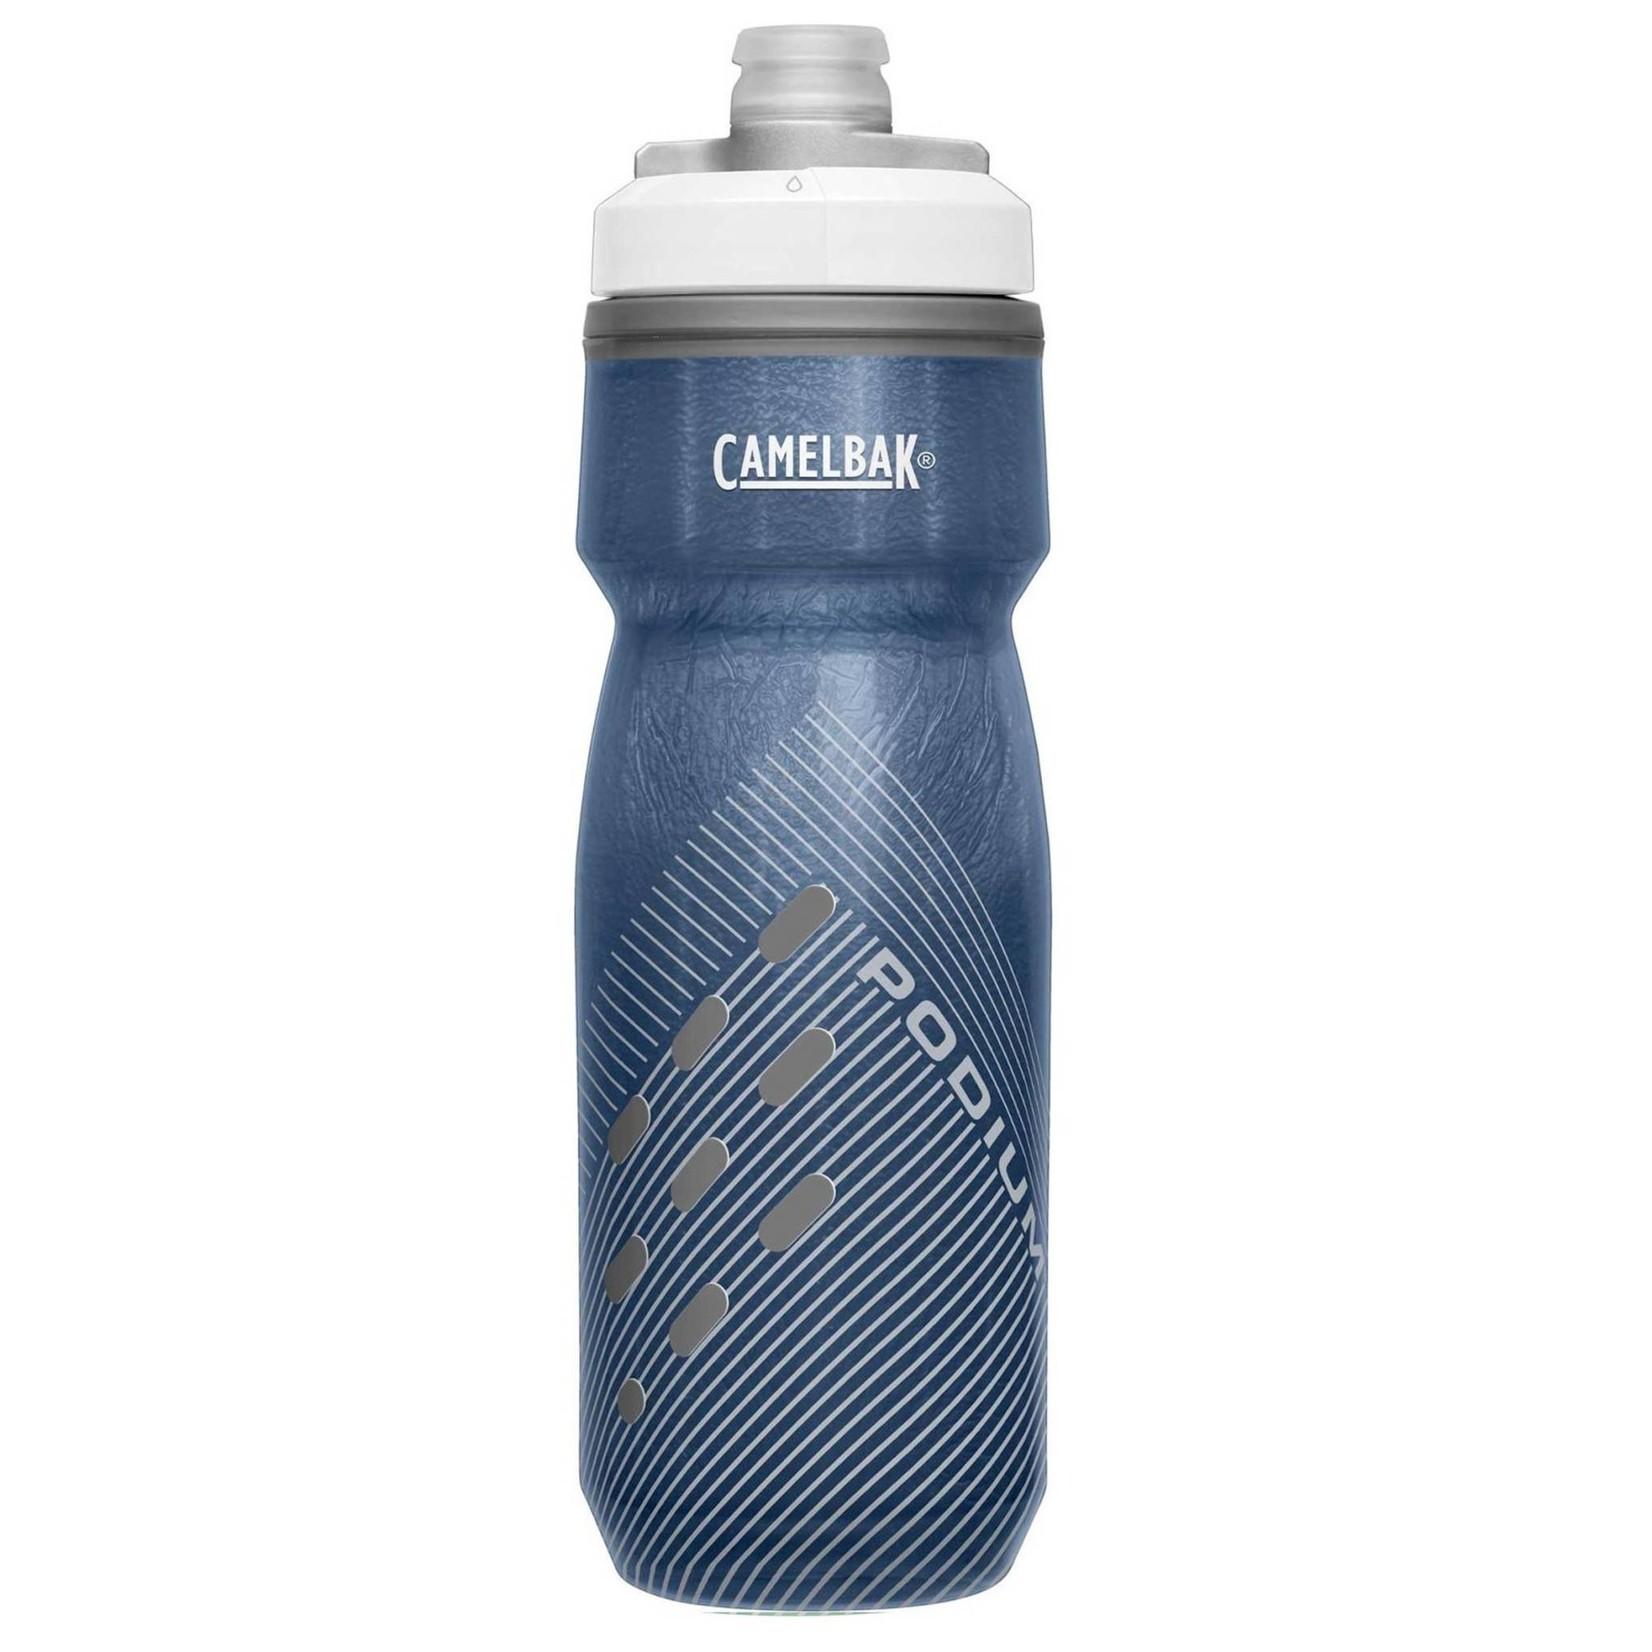 Camelbak Podium Chill Water Bottle Navy Perf 620ml